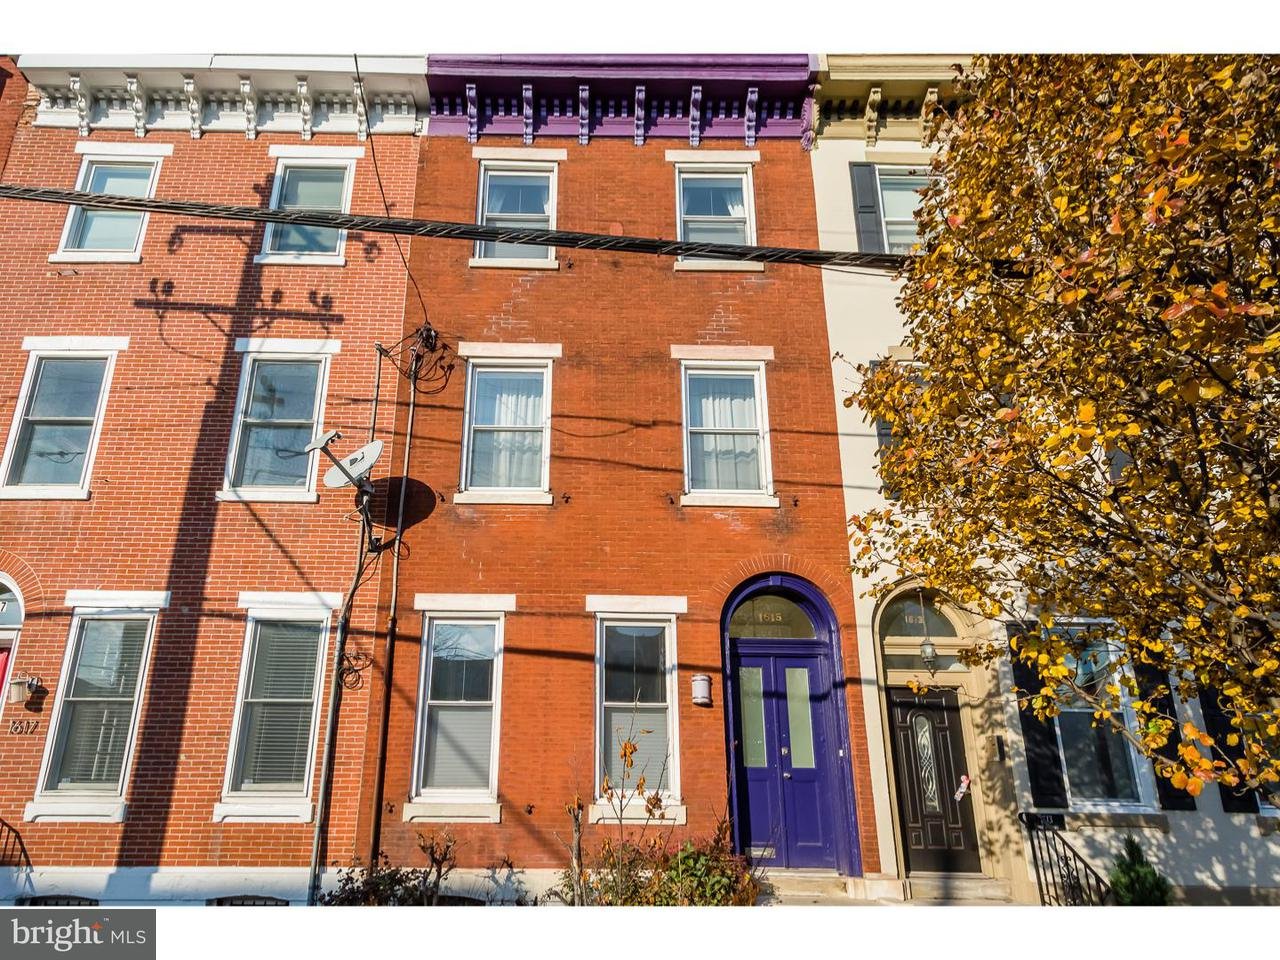 1615  Fairmount Philadelphia, PA 19130